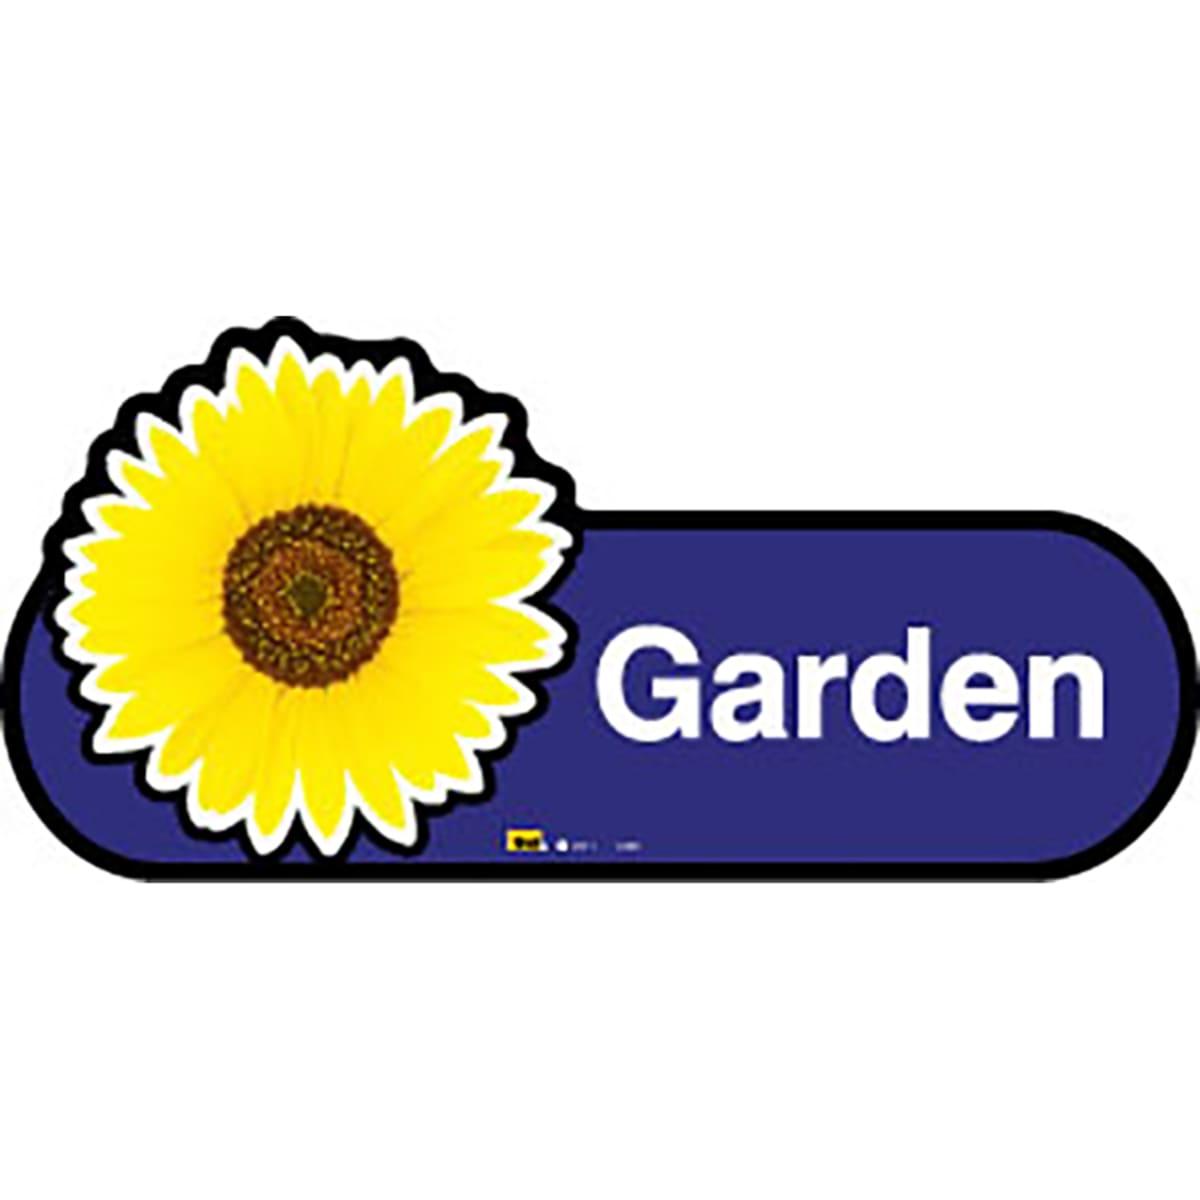 Garden - Dementia Signage